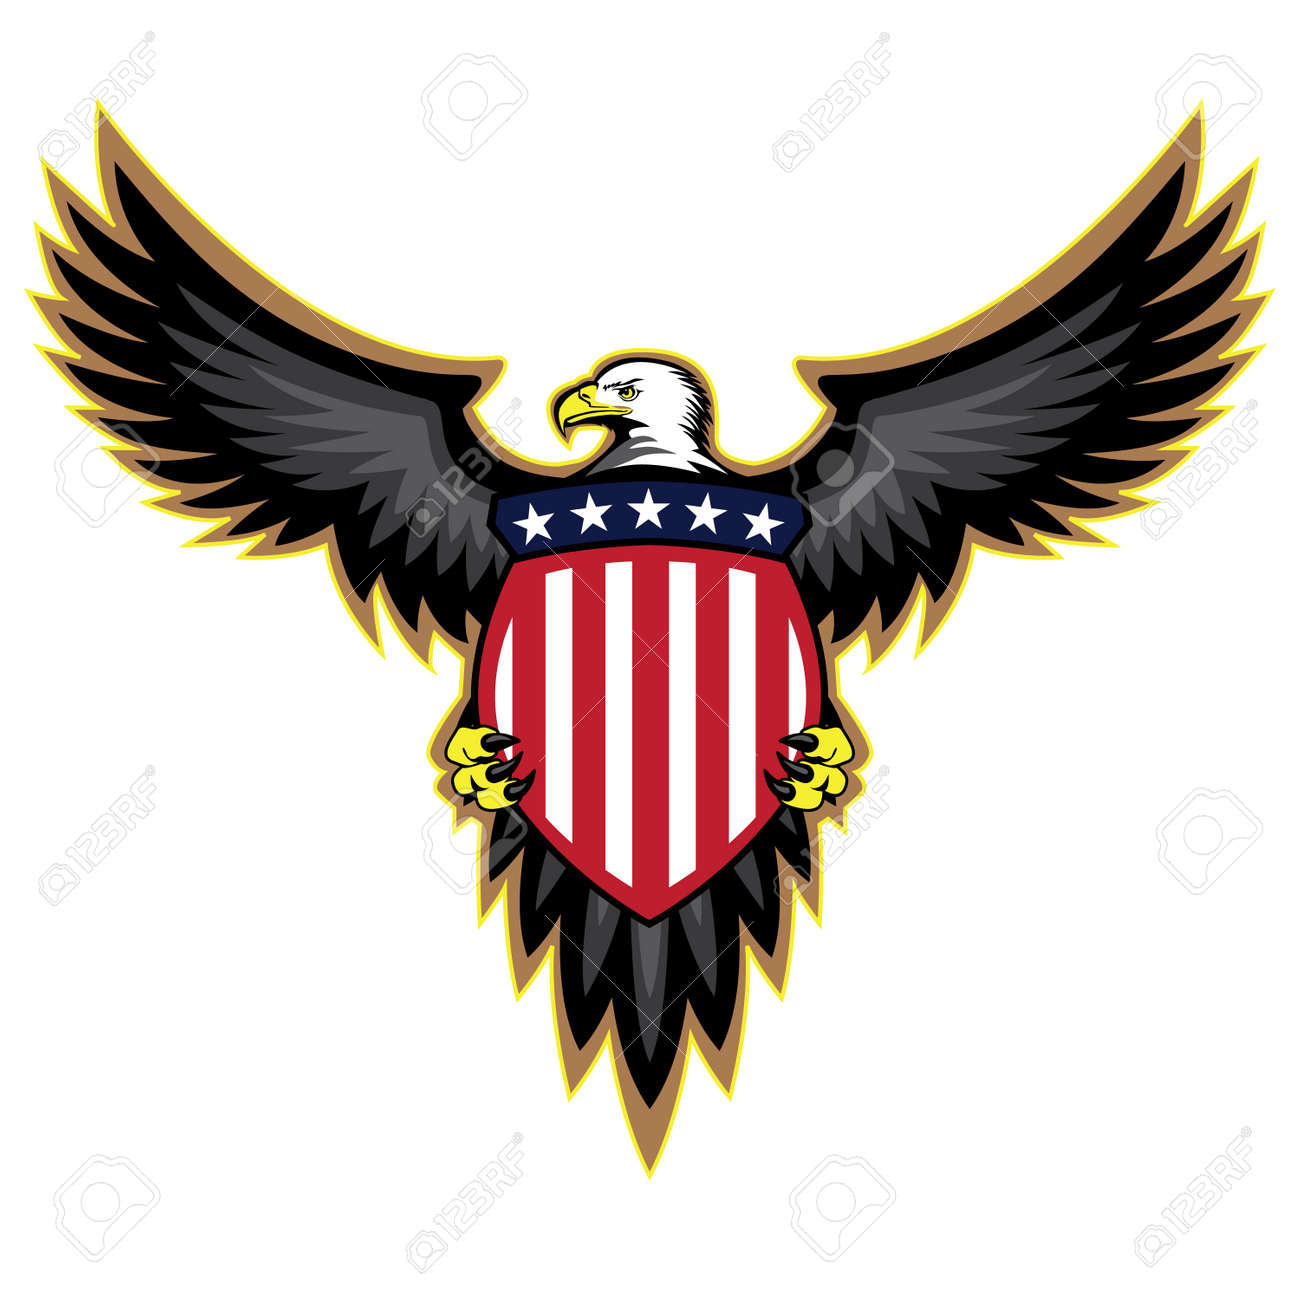 patriotic american eagle wings spread holding shield royalty free